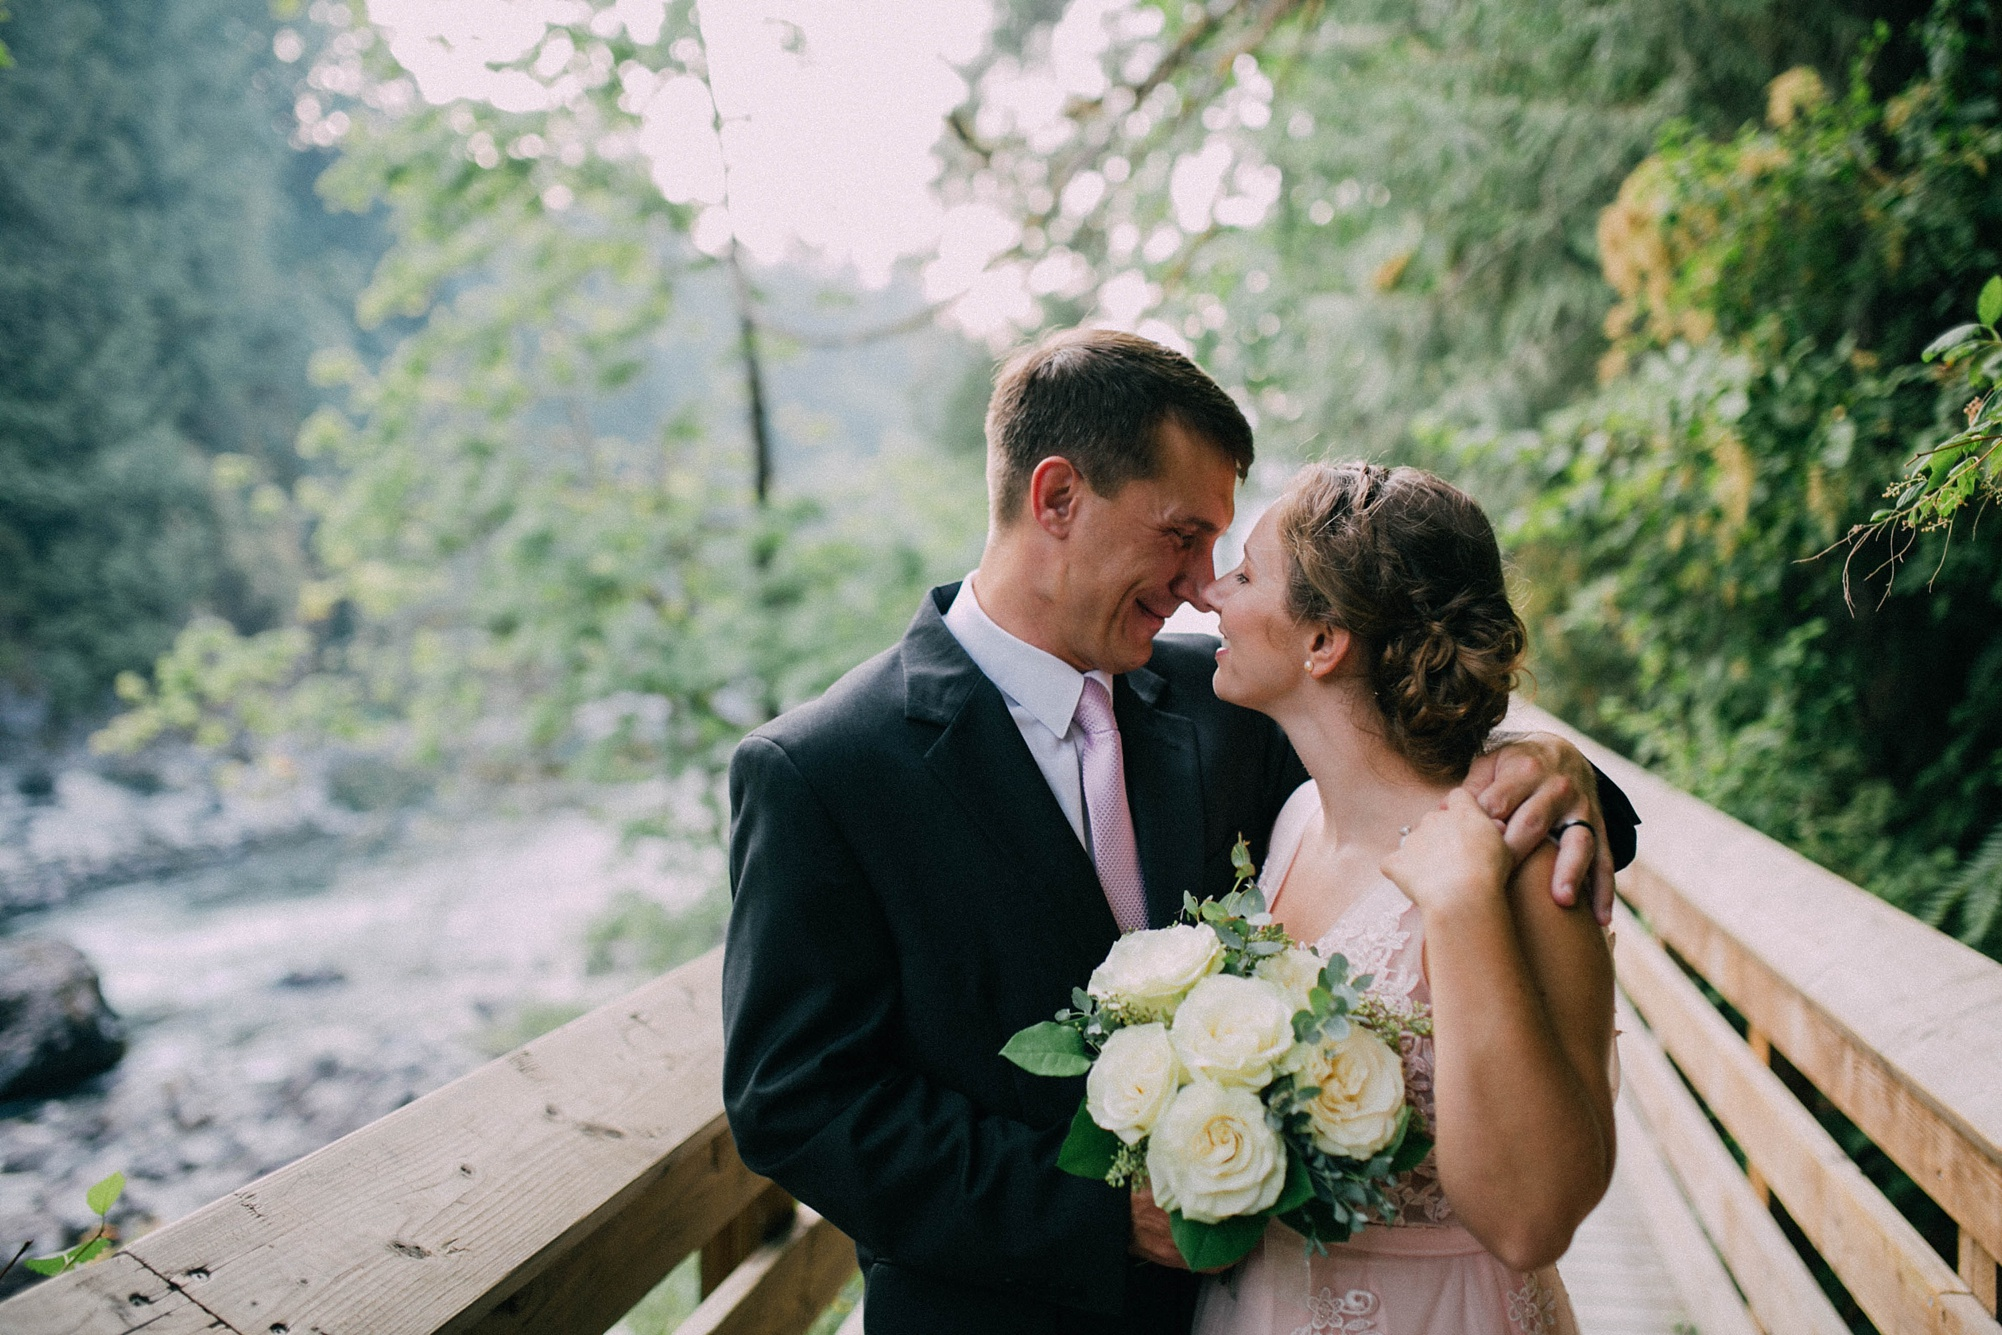 ashley_vos_seattle_ wedding_photographer_0490.jpg